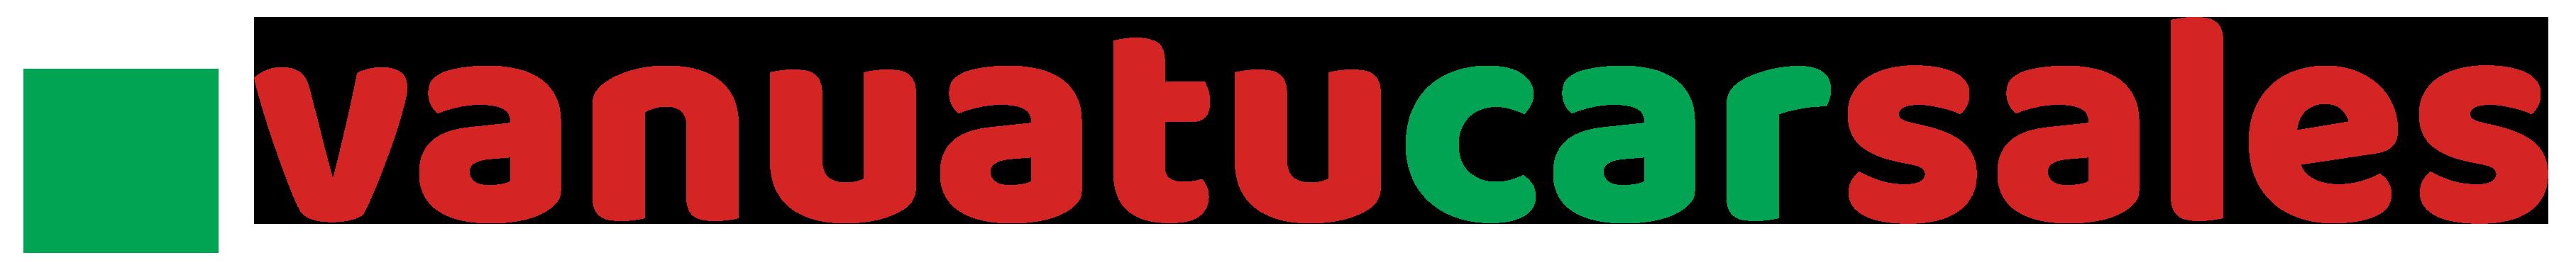 Vanuatucarsales logo